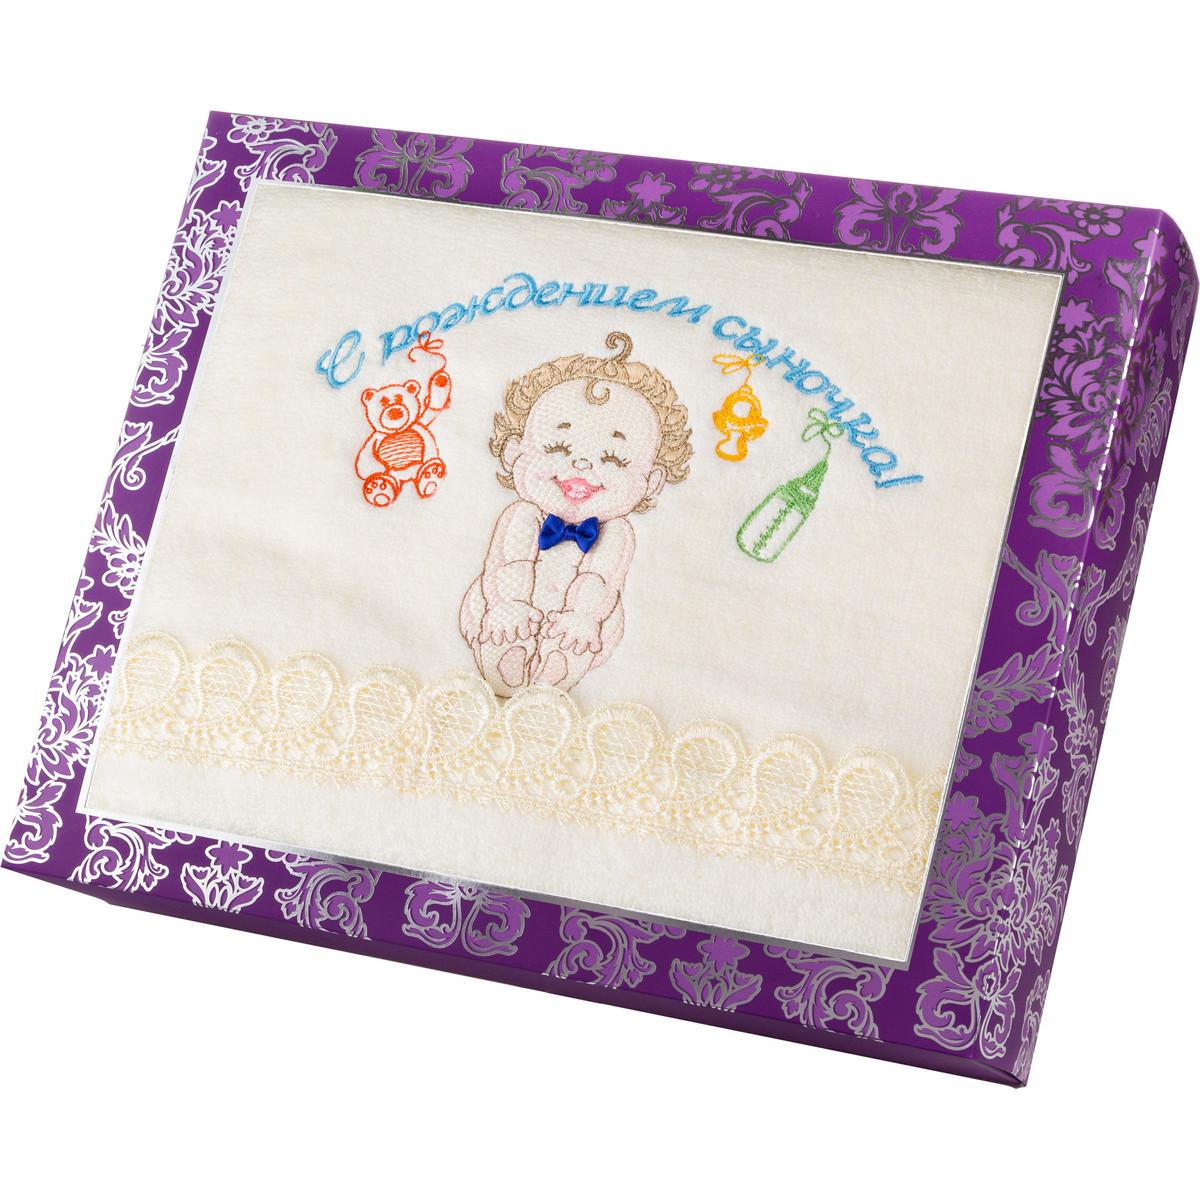 Полотенца Santalino Детское полотенце Avilon  (70х140 см) bravo полотенце детское пони 33 x 70 см 1089